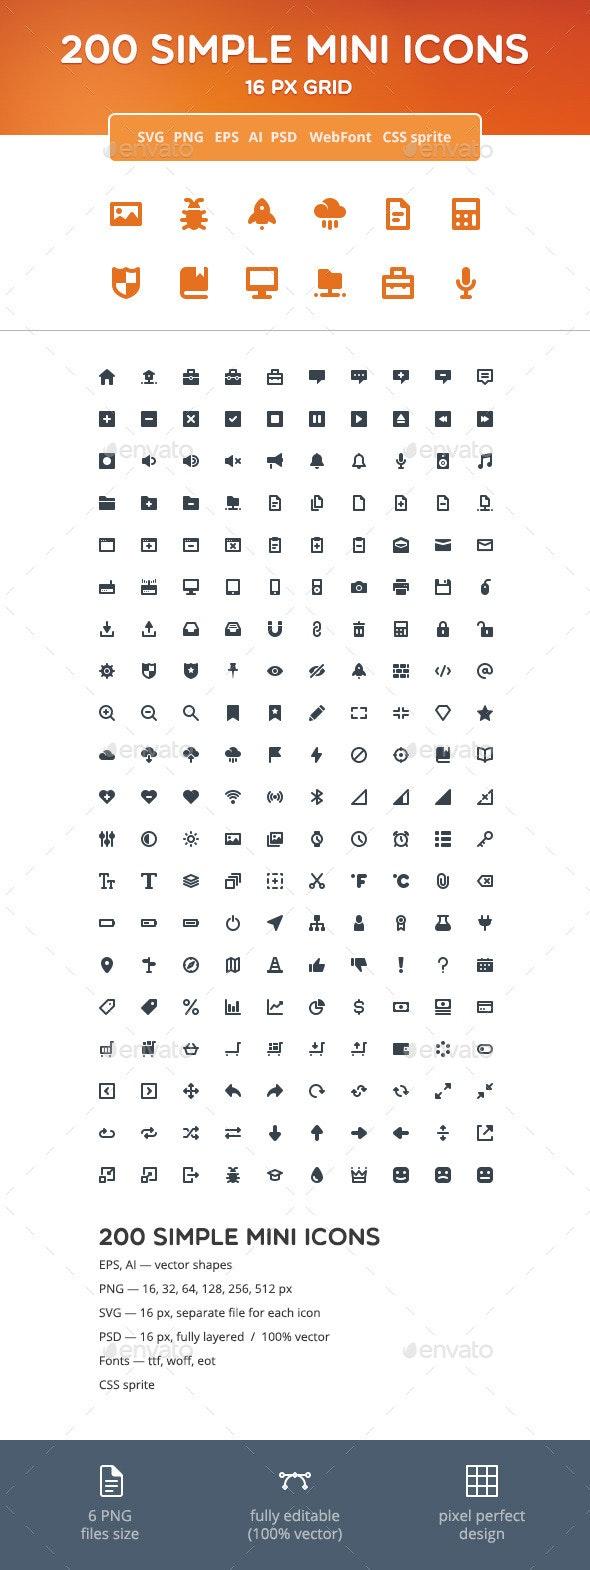 Simple Mini Icons